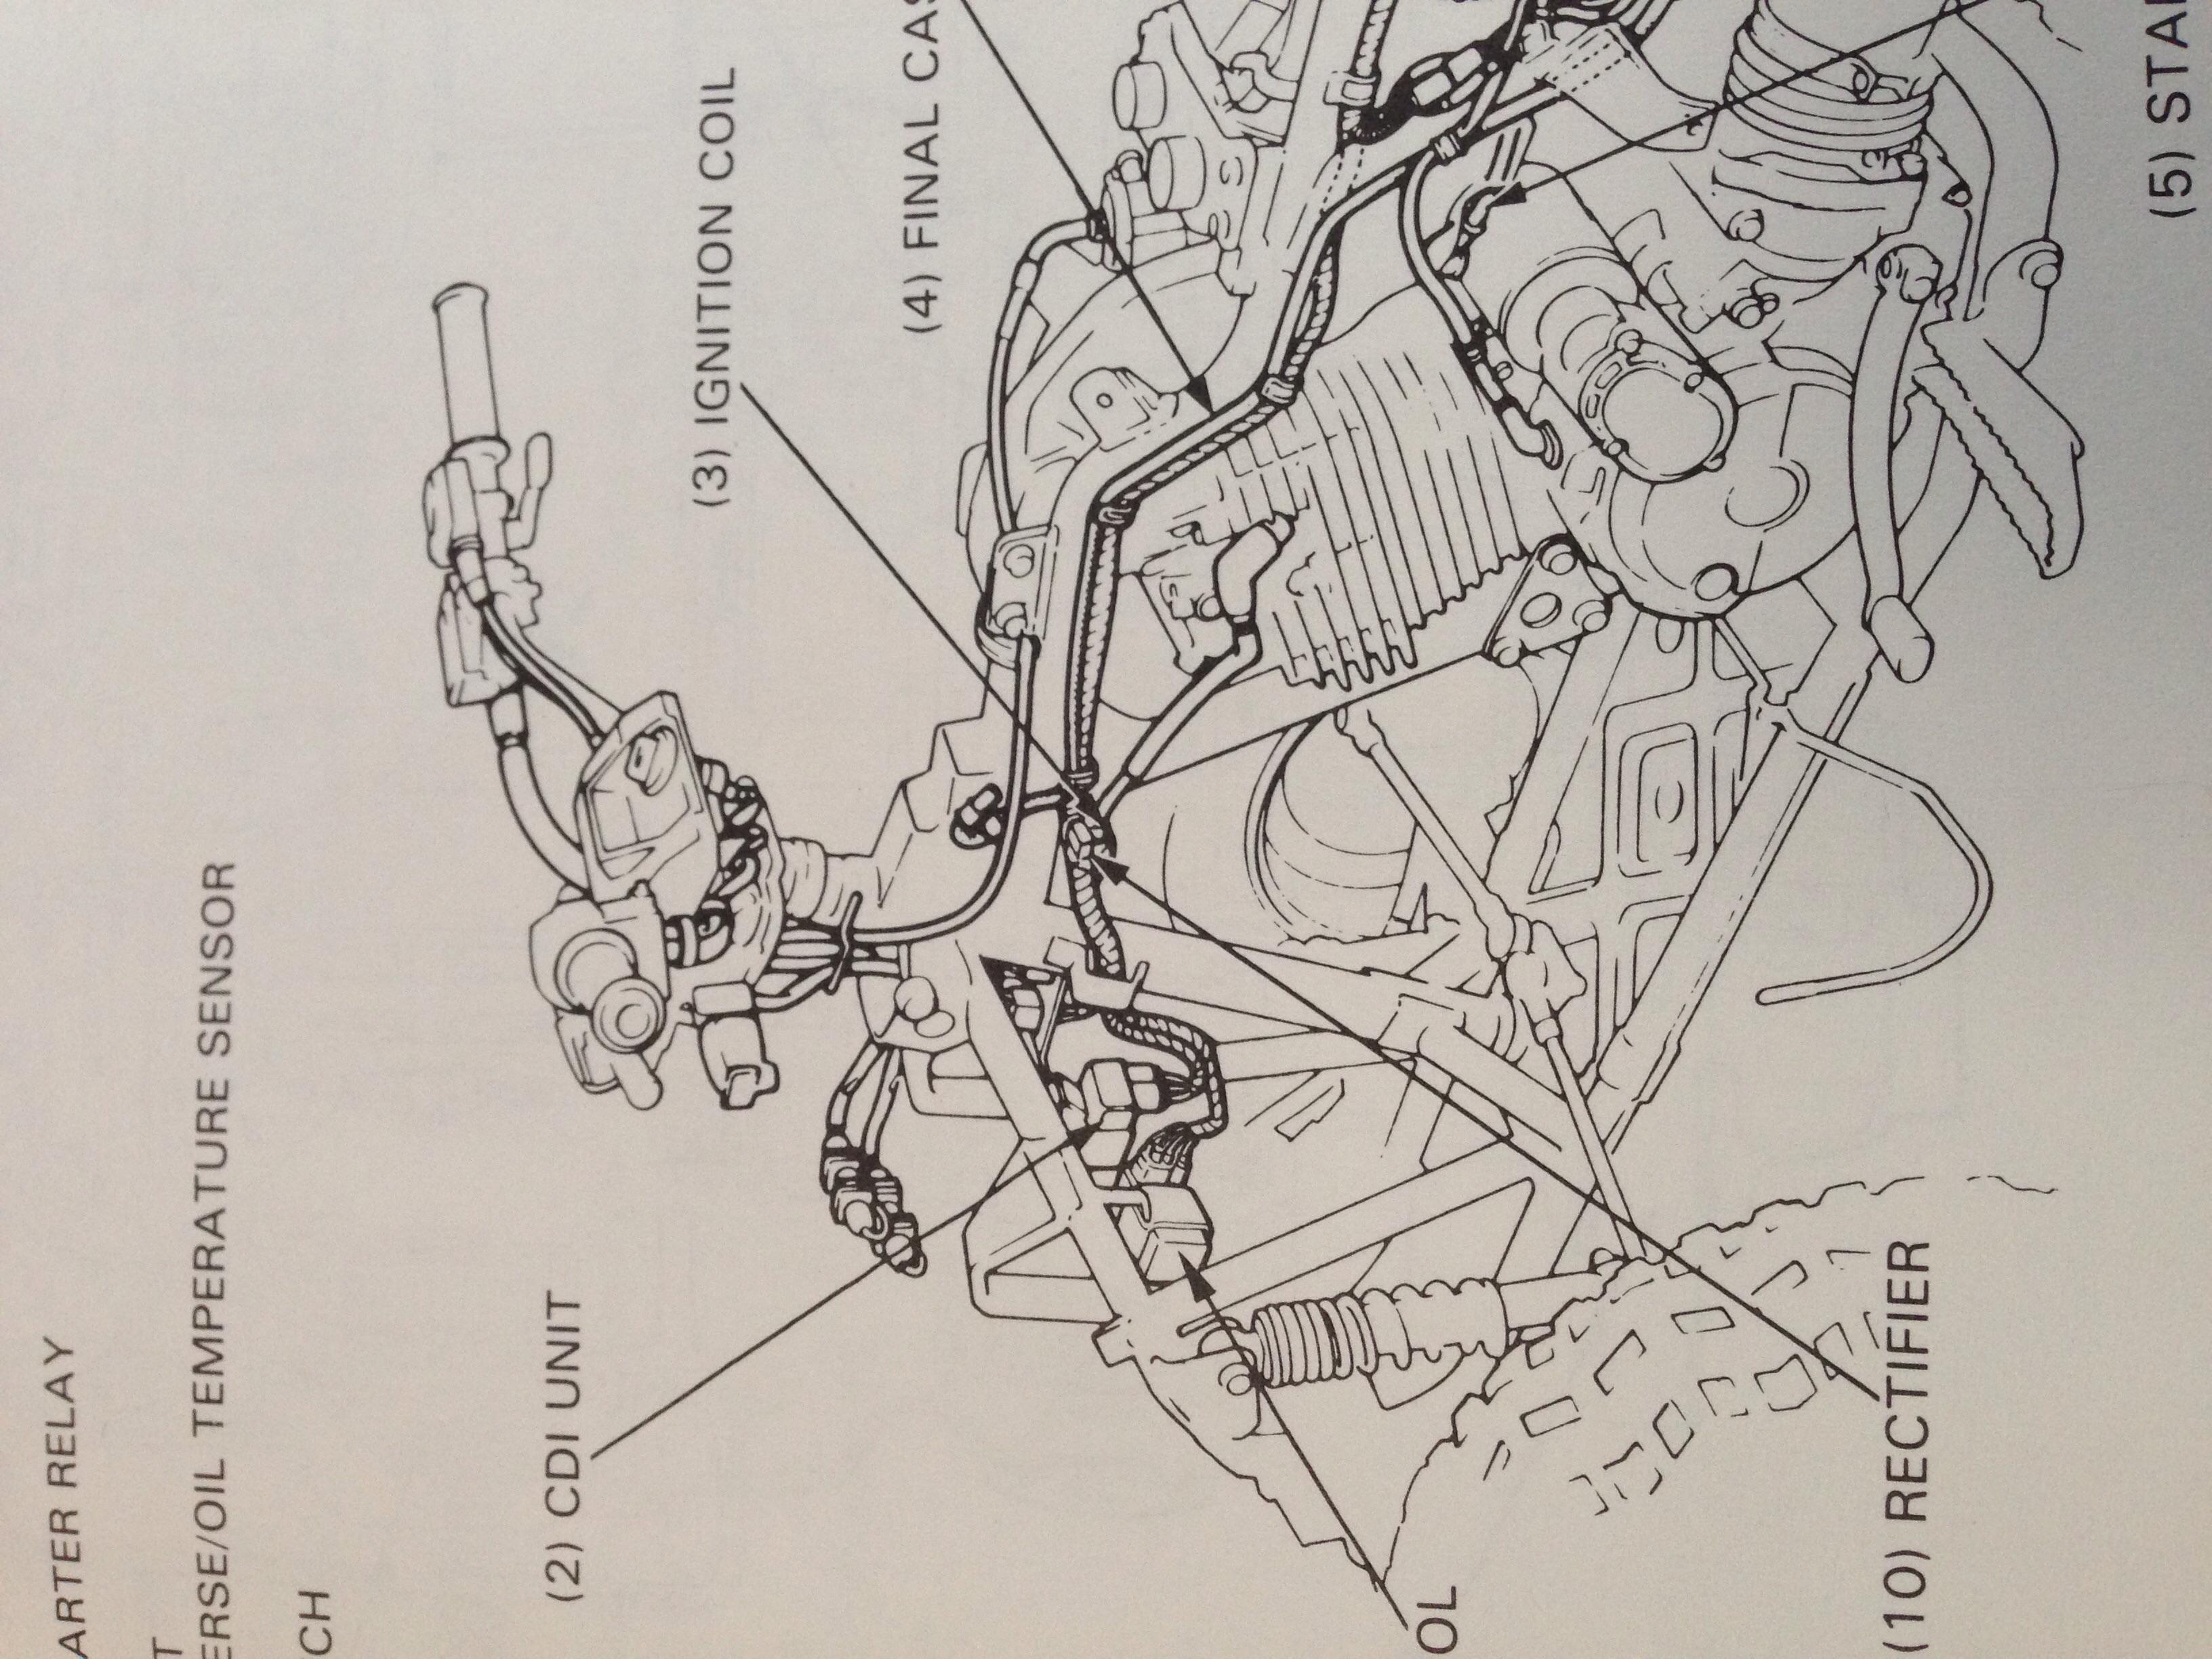 1987 honda fourtrax 250 no spark honda atv forumclick image for larger version name image jpg views 953 size 1 92